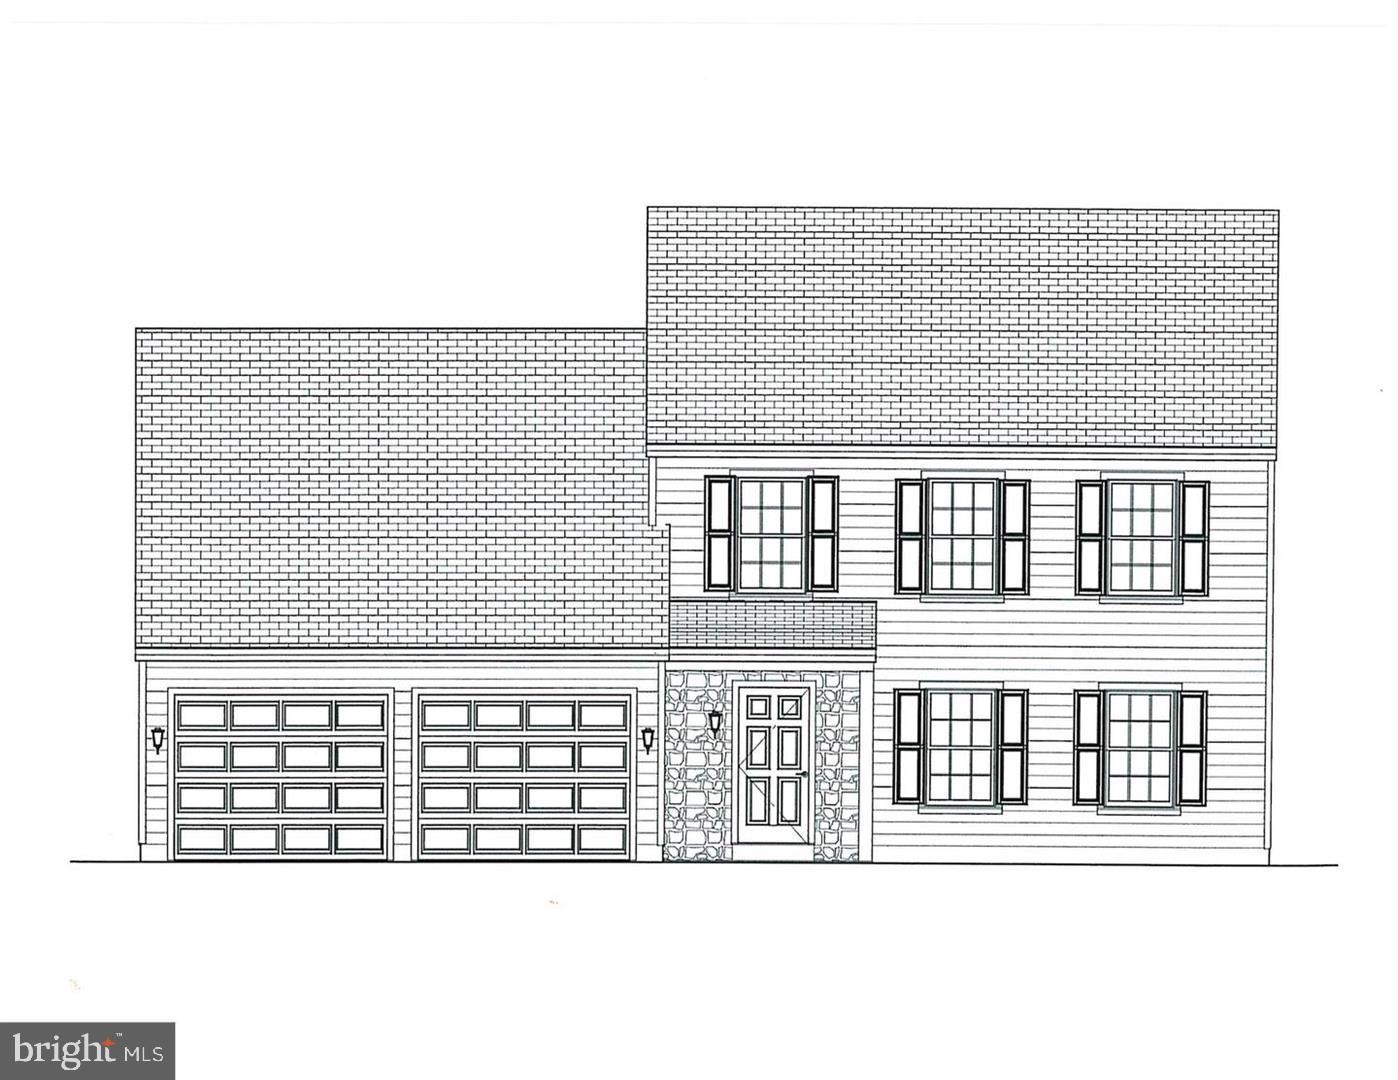 43 GLENBROOK ROAD, LEOLA, PA 17540